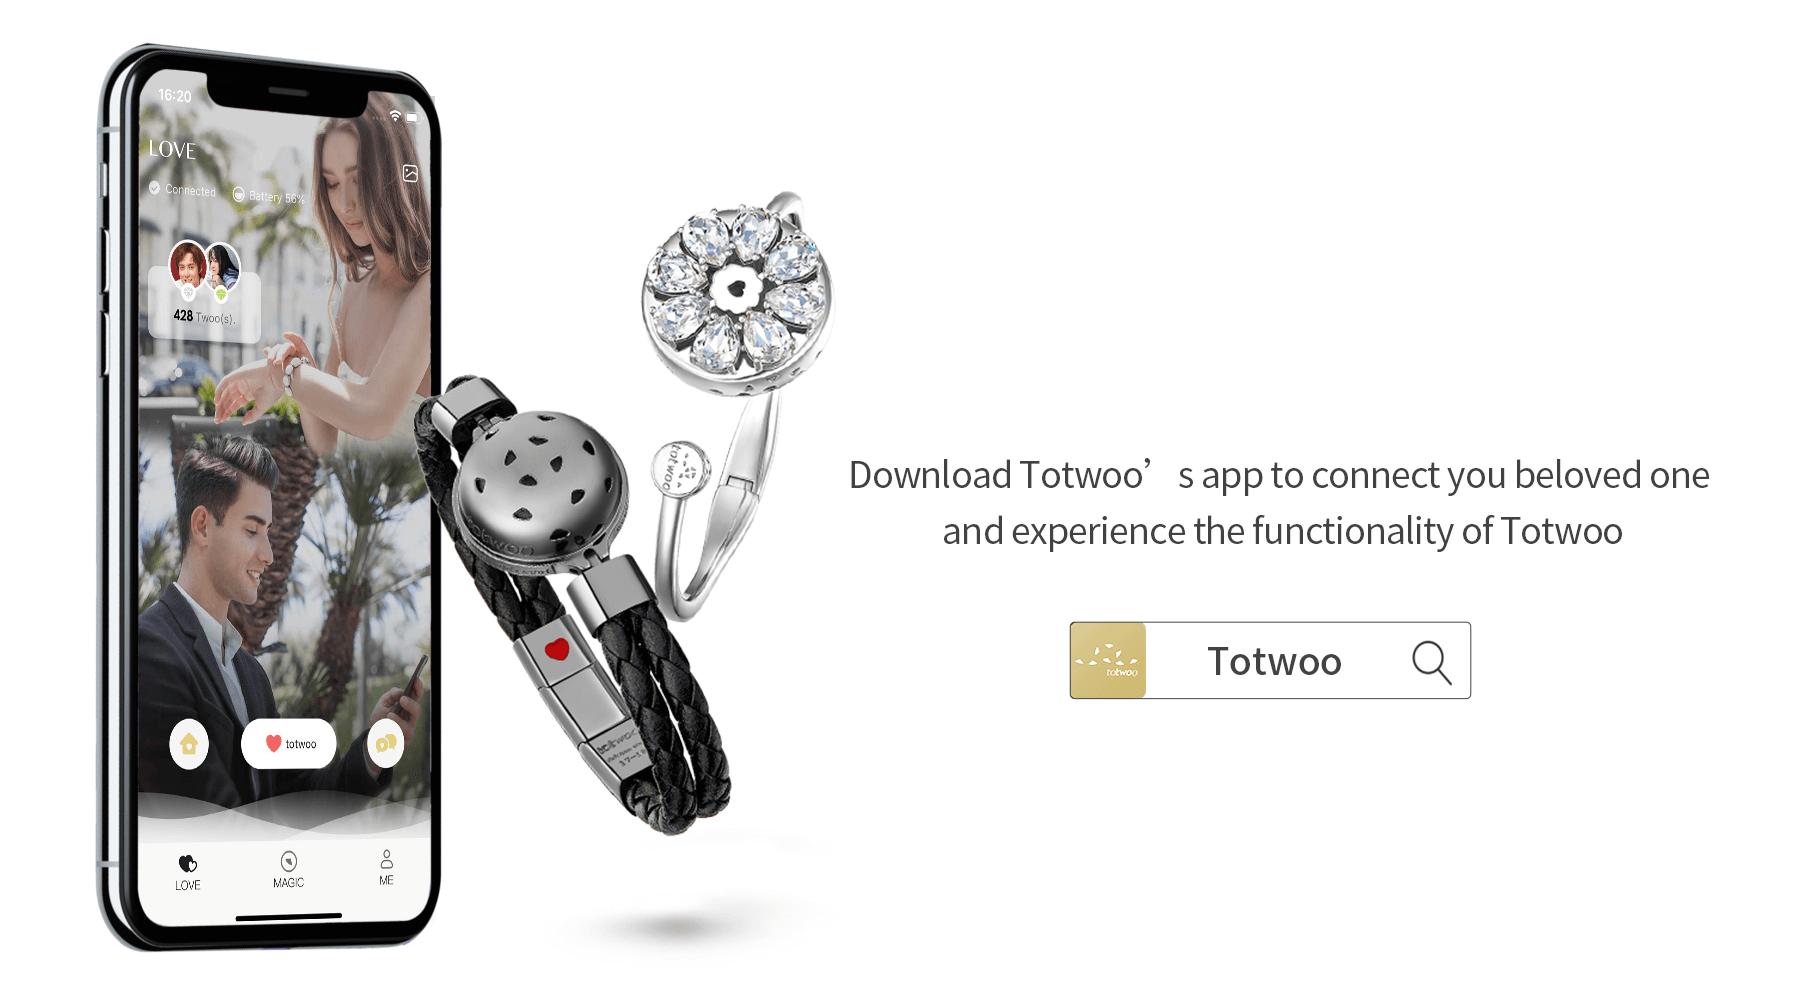 Totwoo couple app